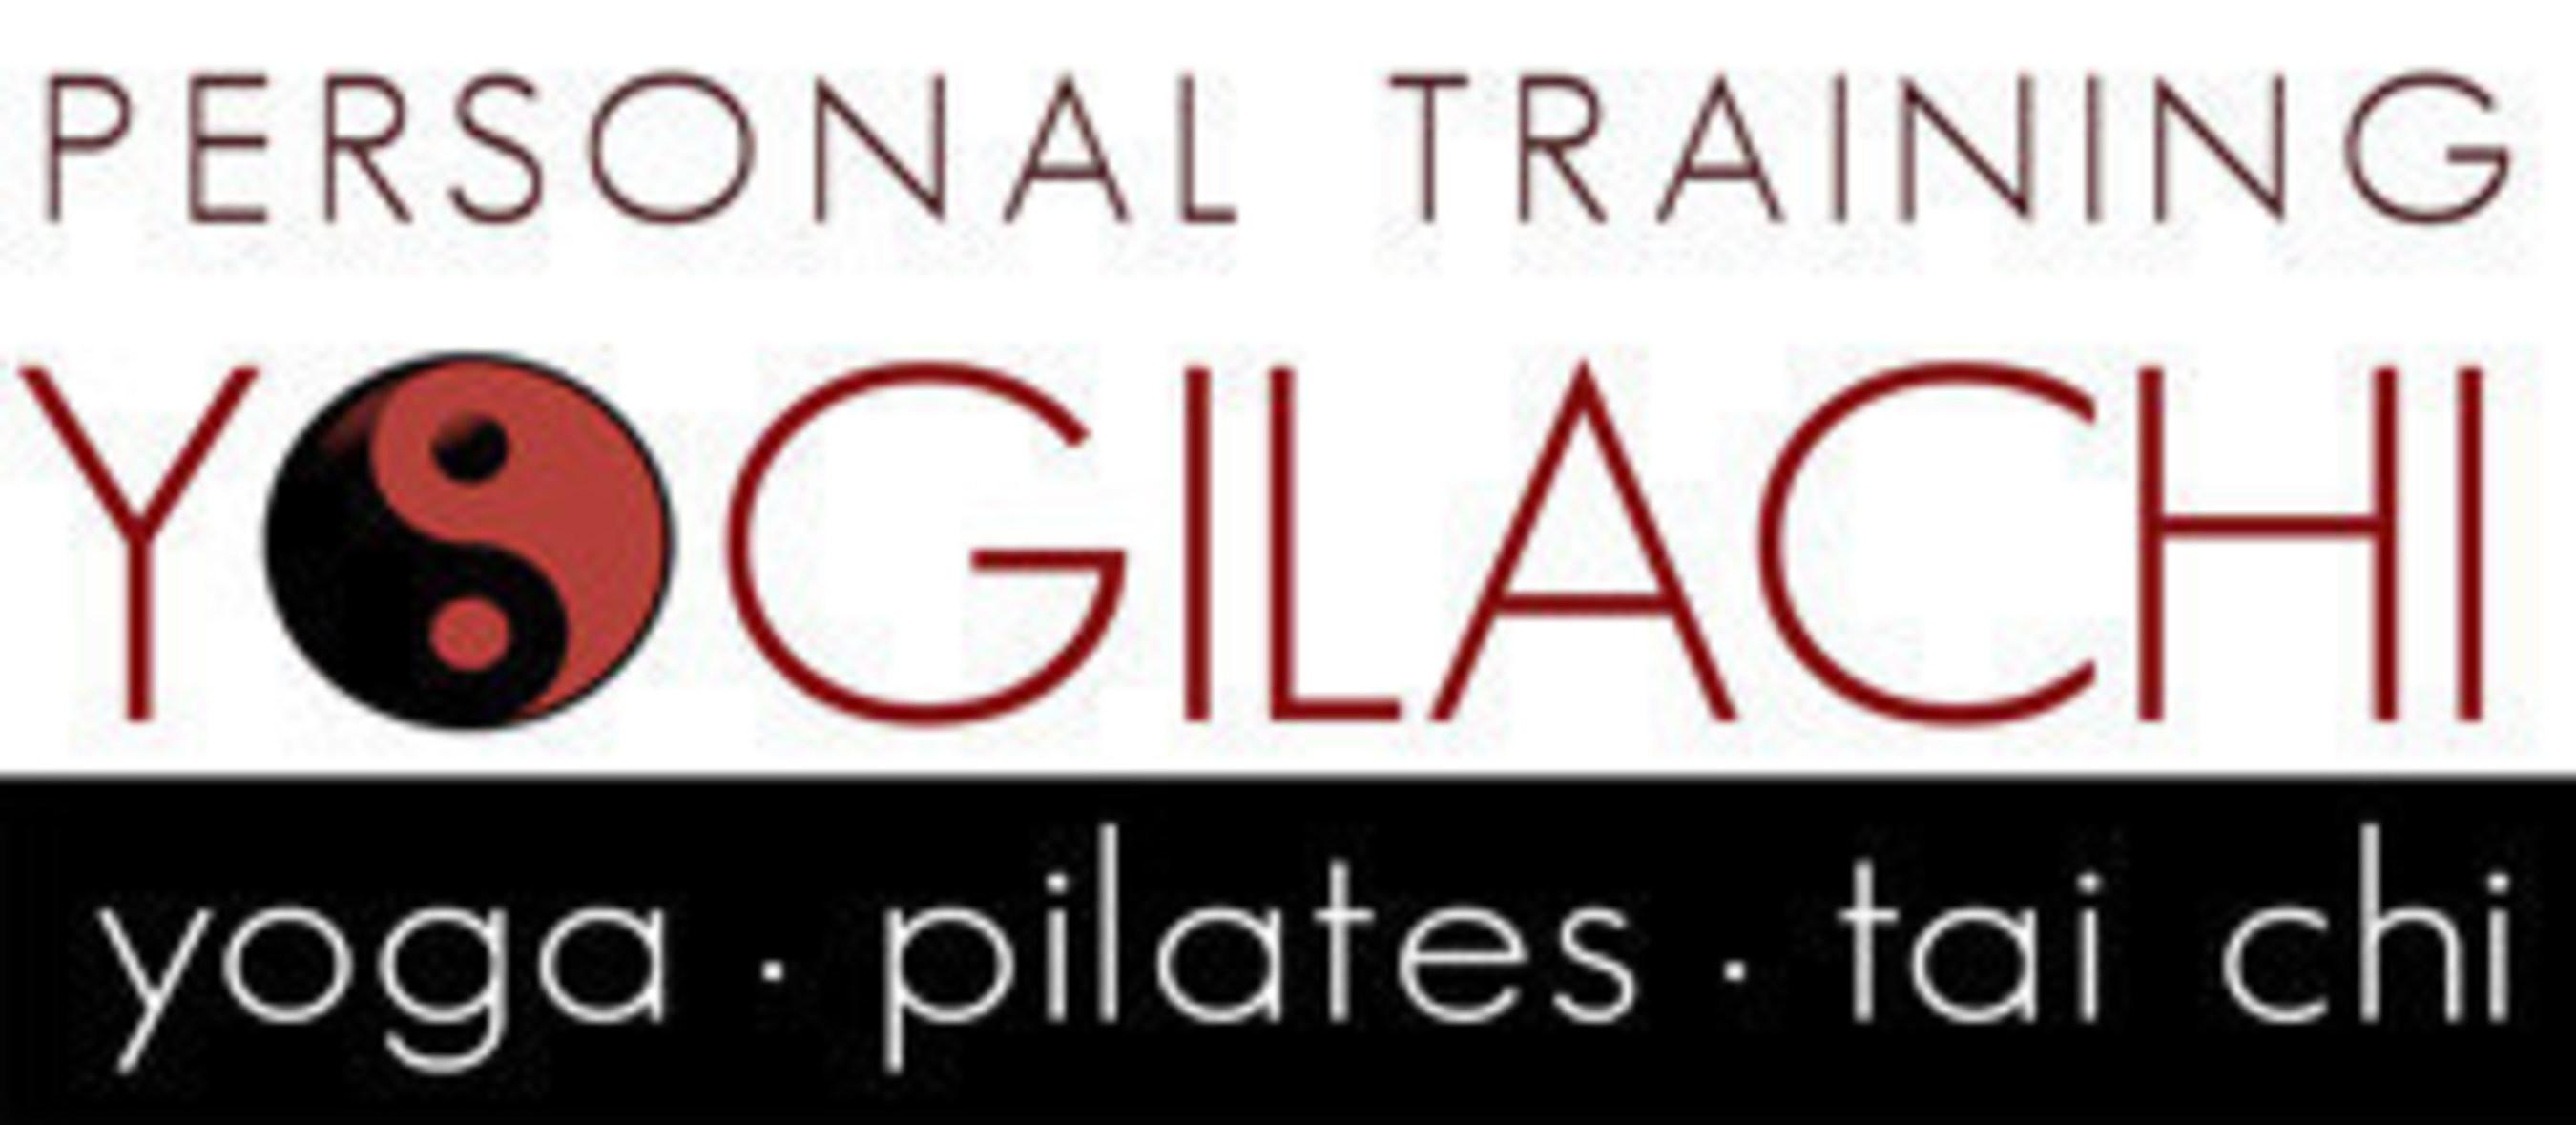 Leading Personal Training Studio Brings Health